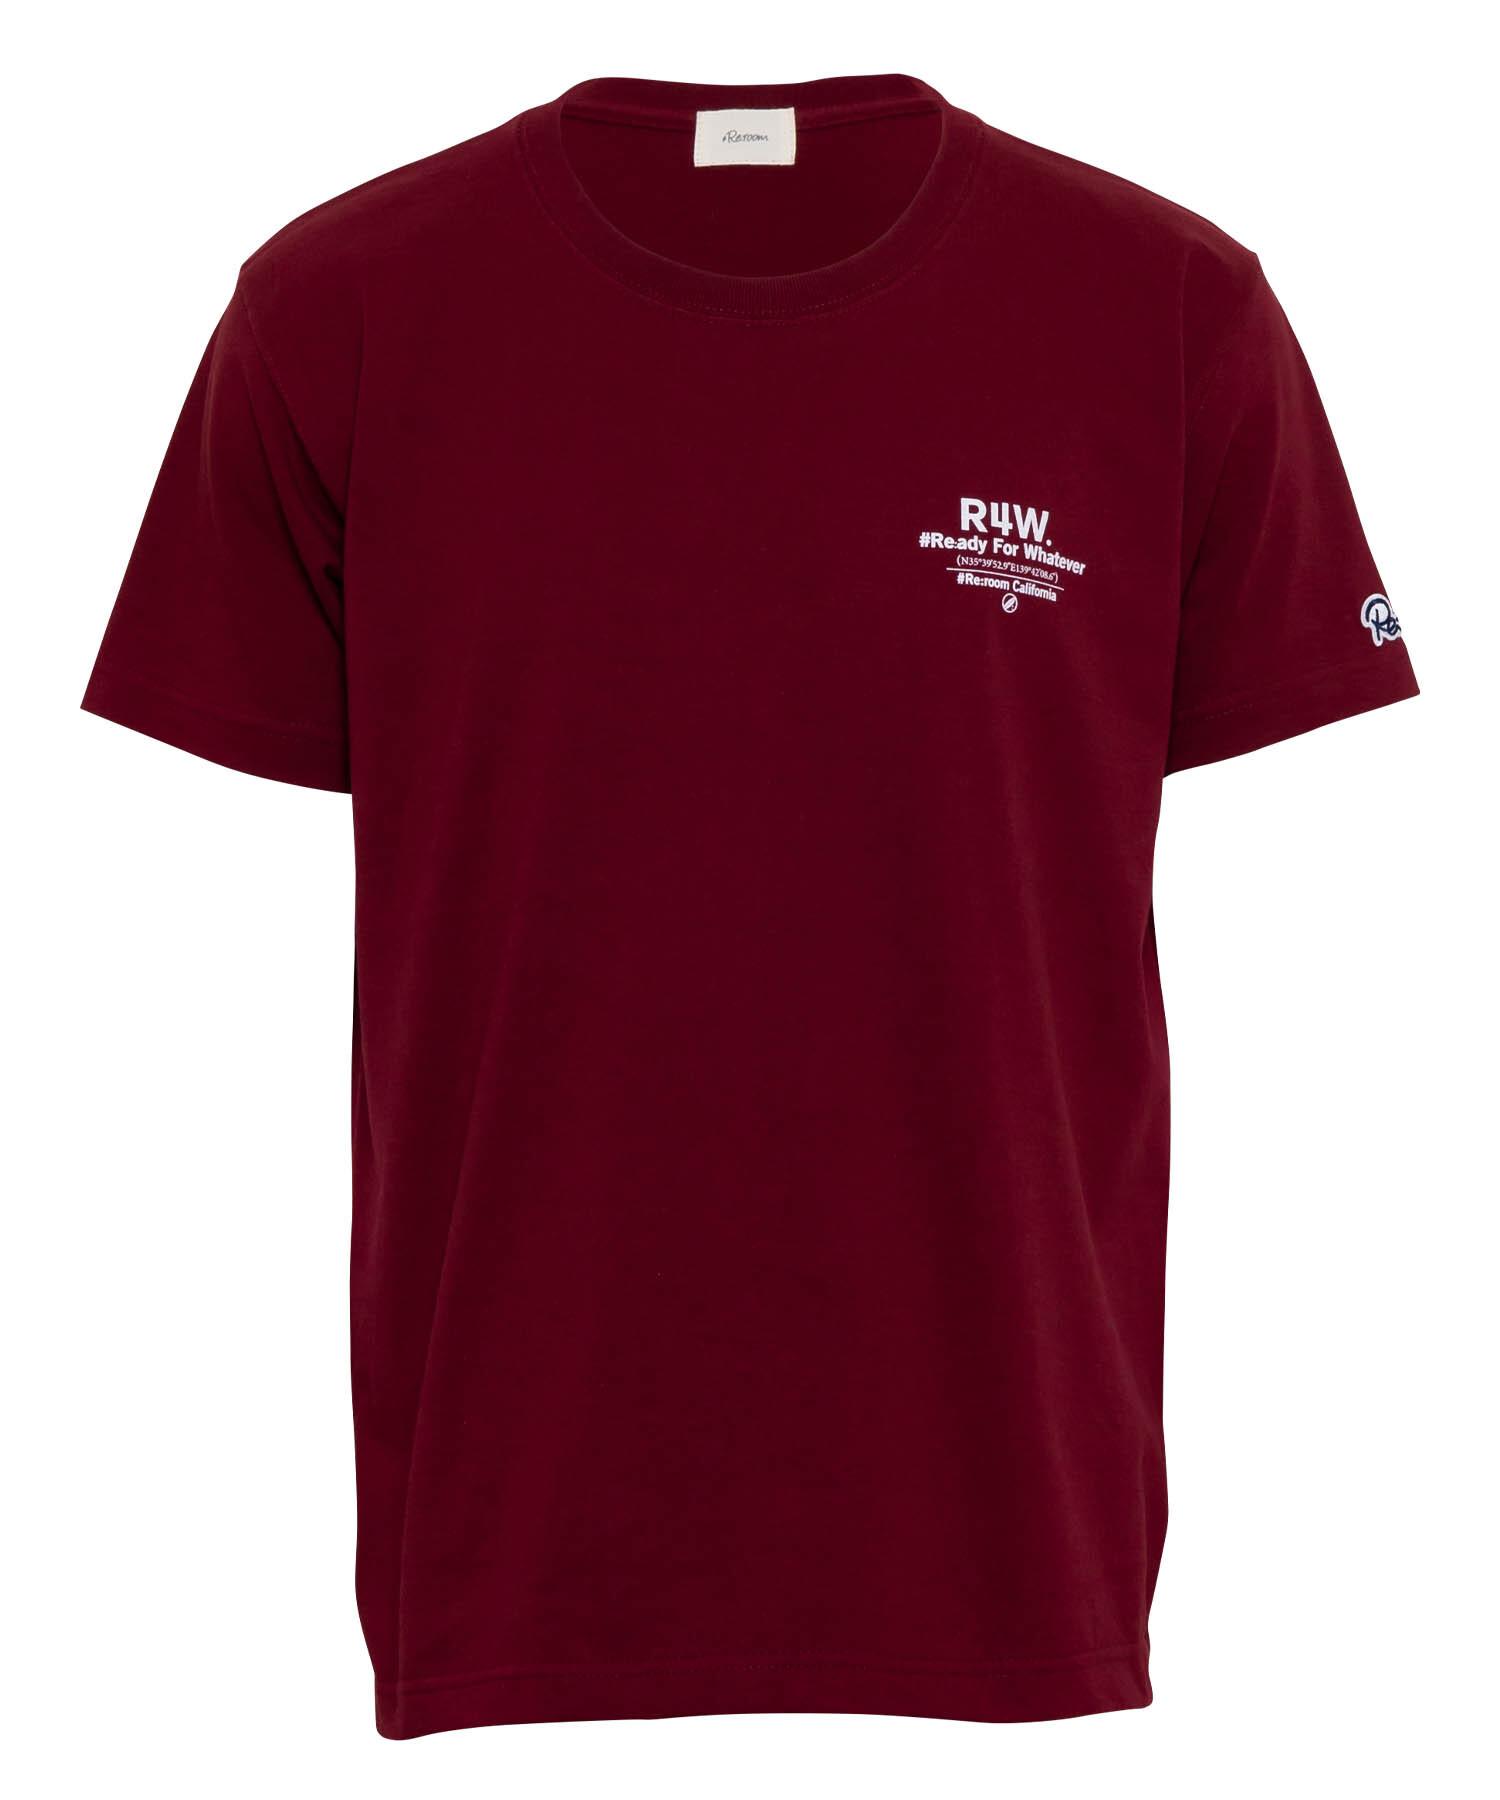 R4W MESSAGE PRINT T-shirt[REC373]